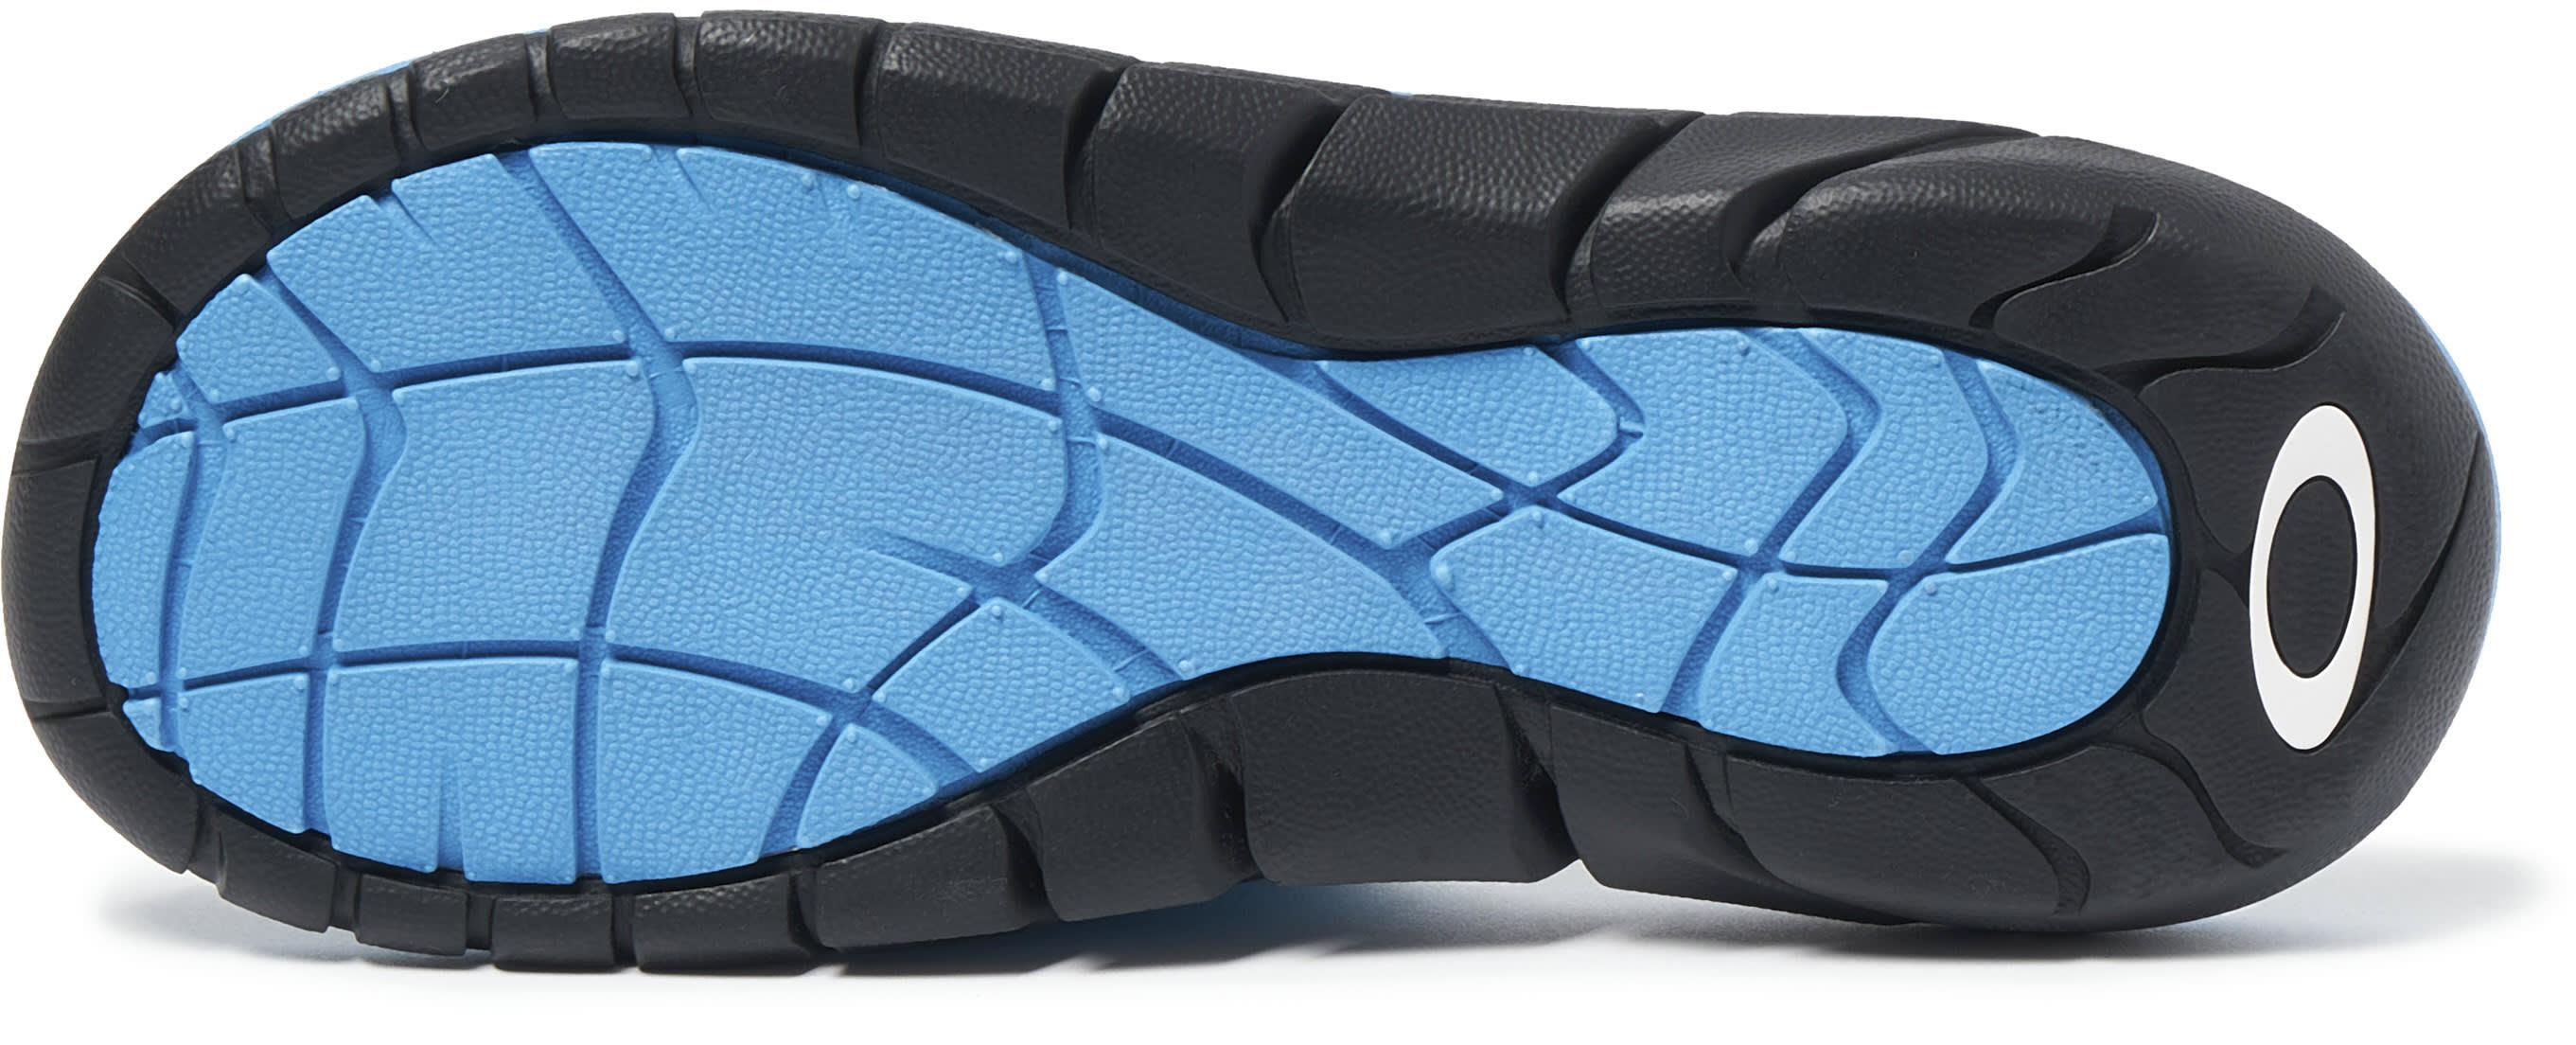 90082b60a82 Oakley Super Coil Slide 2.5 Sandals - thumbnail 5